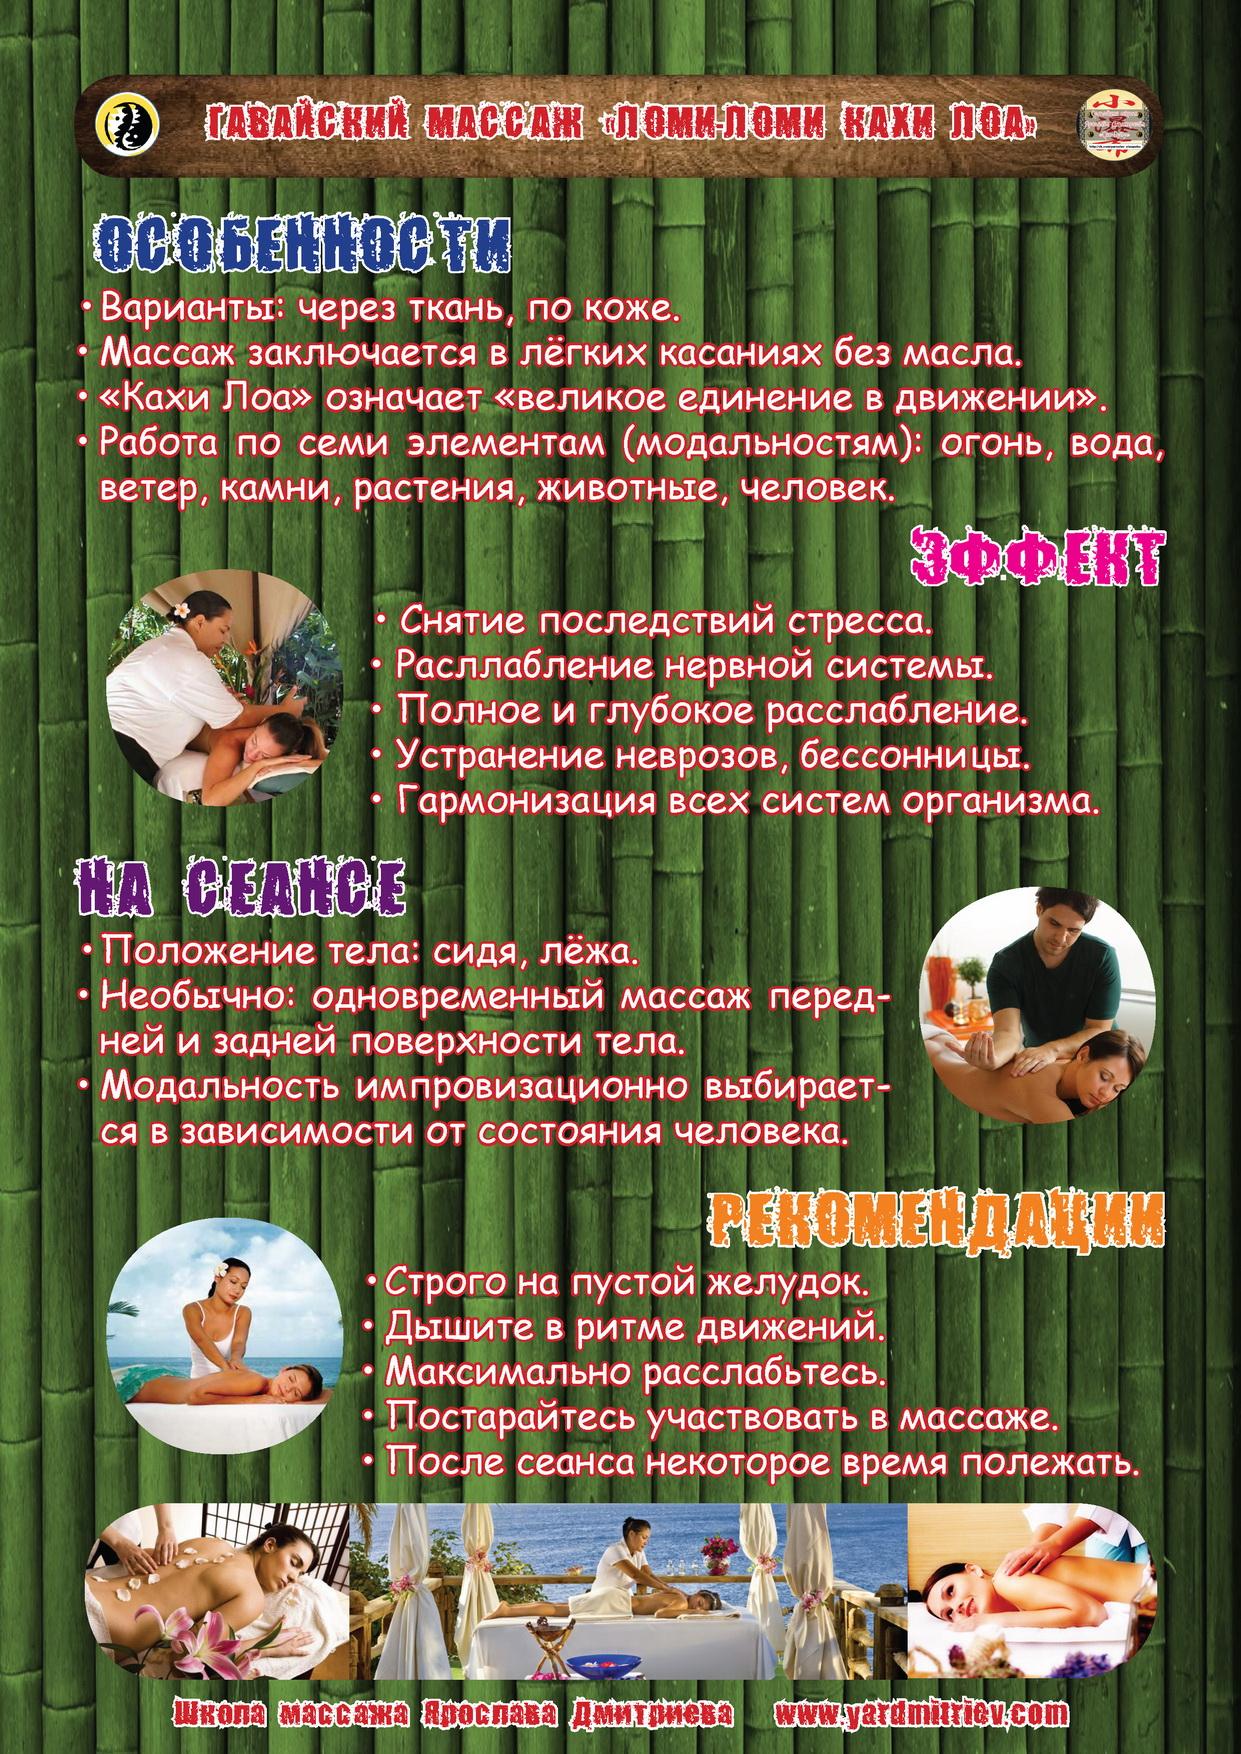 Гавайский массаж ломи-ломи кахи-лоа